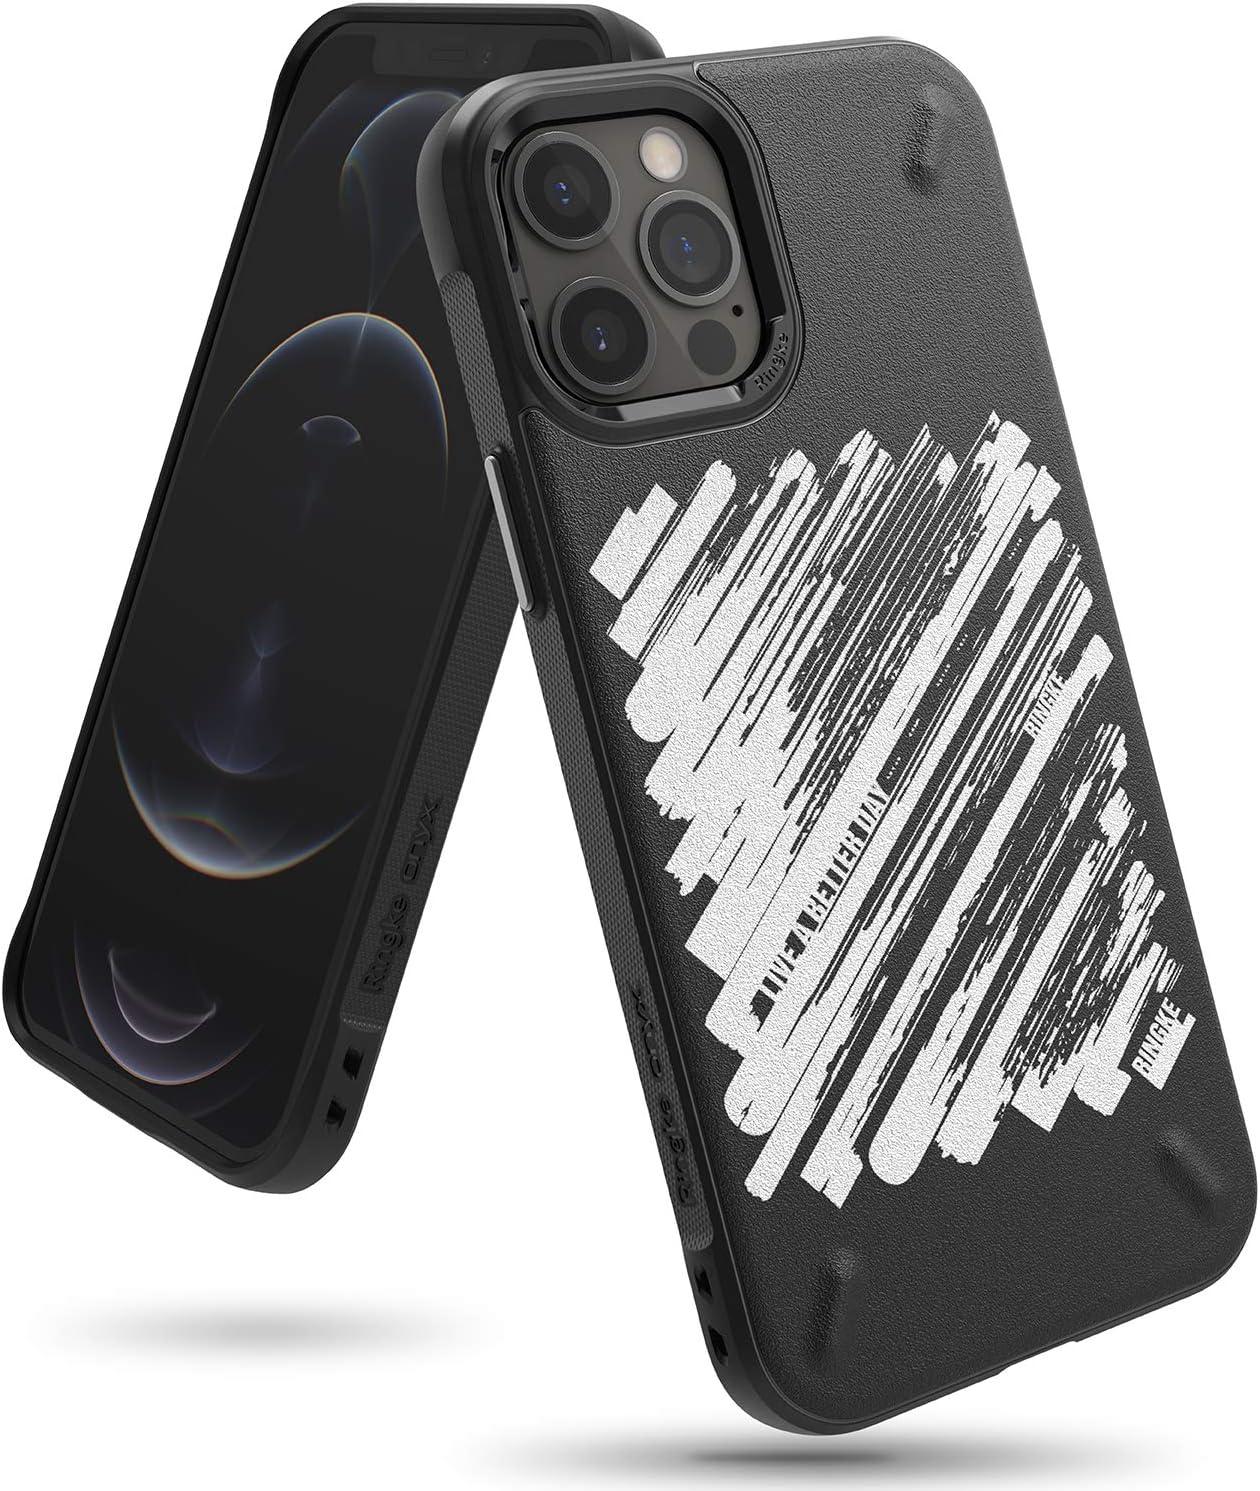 Ringke Onyx Design Kompatibel Mit Iphone 12 Pro Max Elektronik